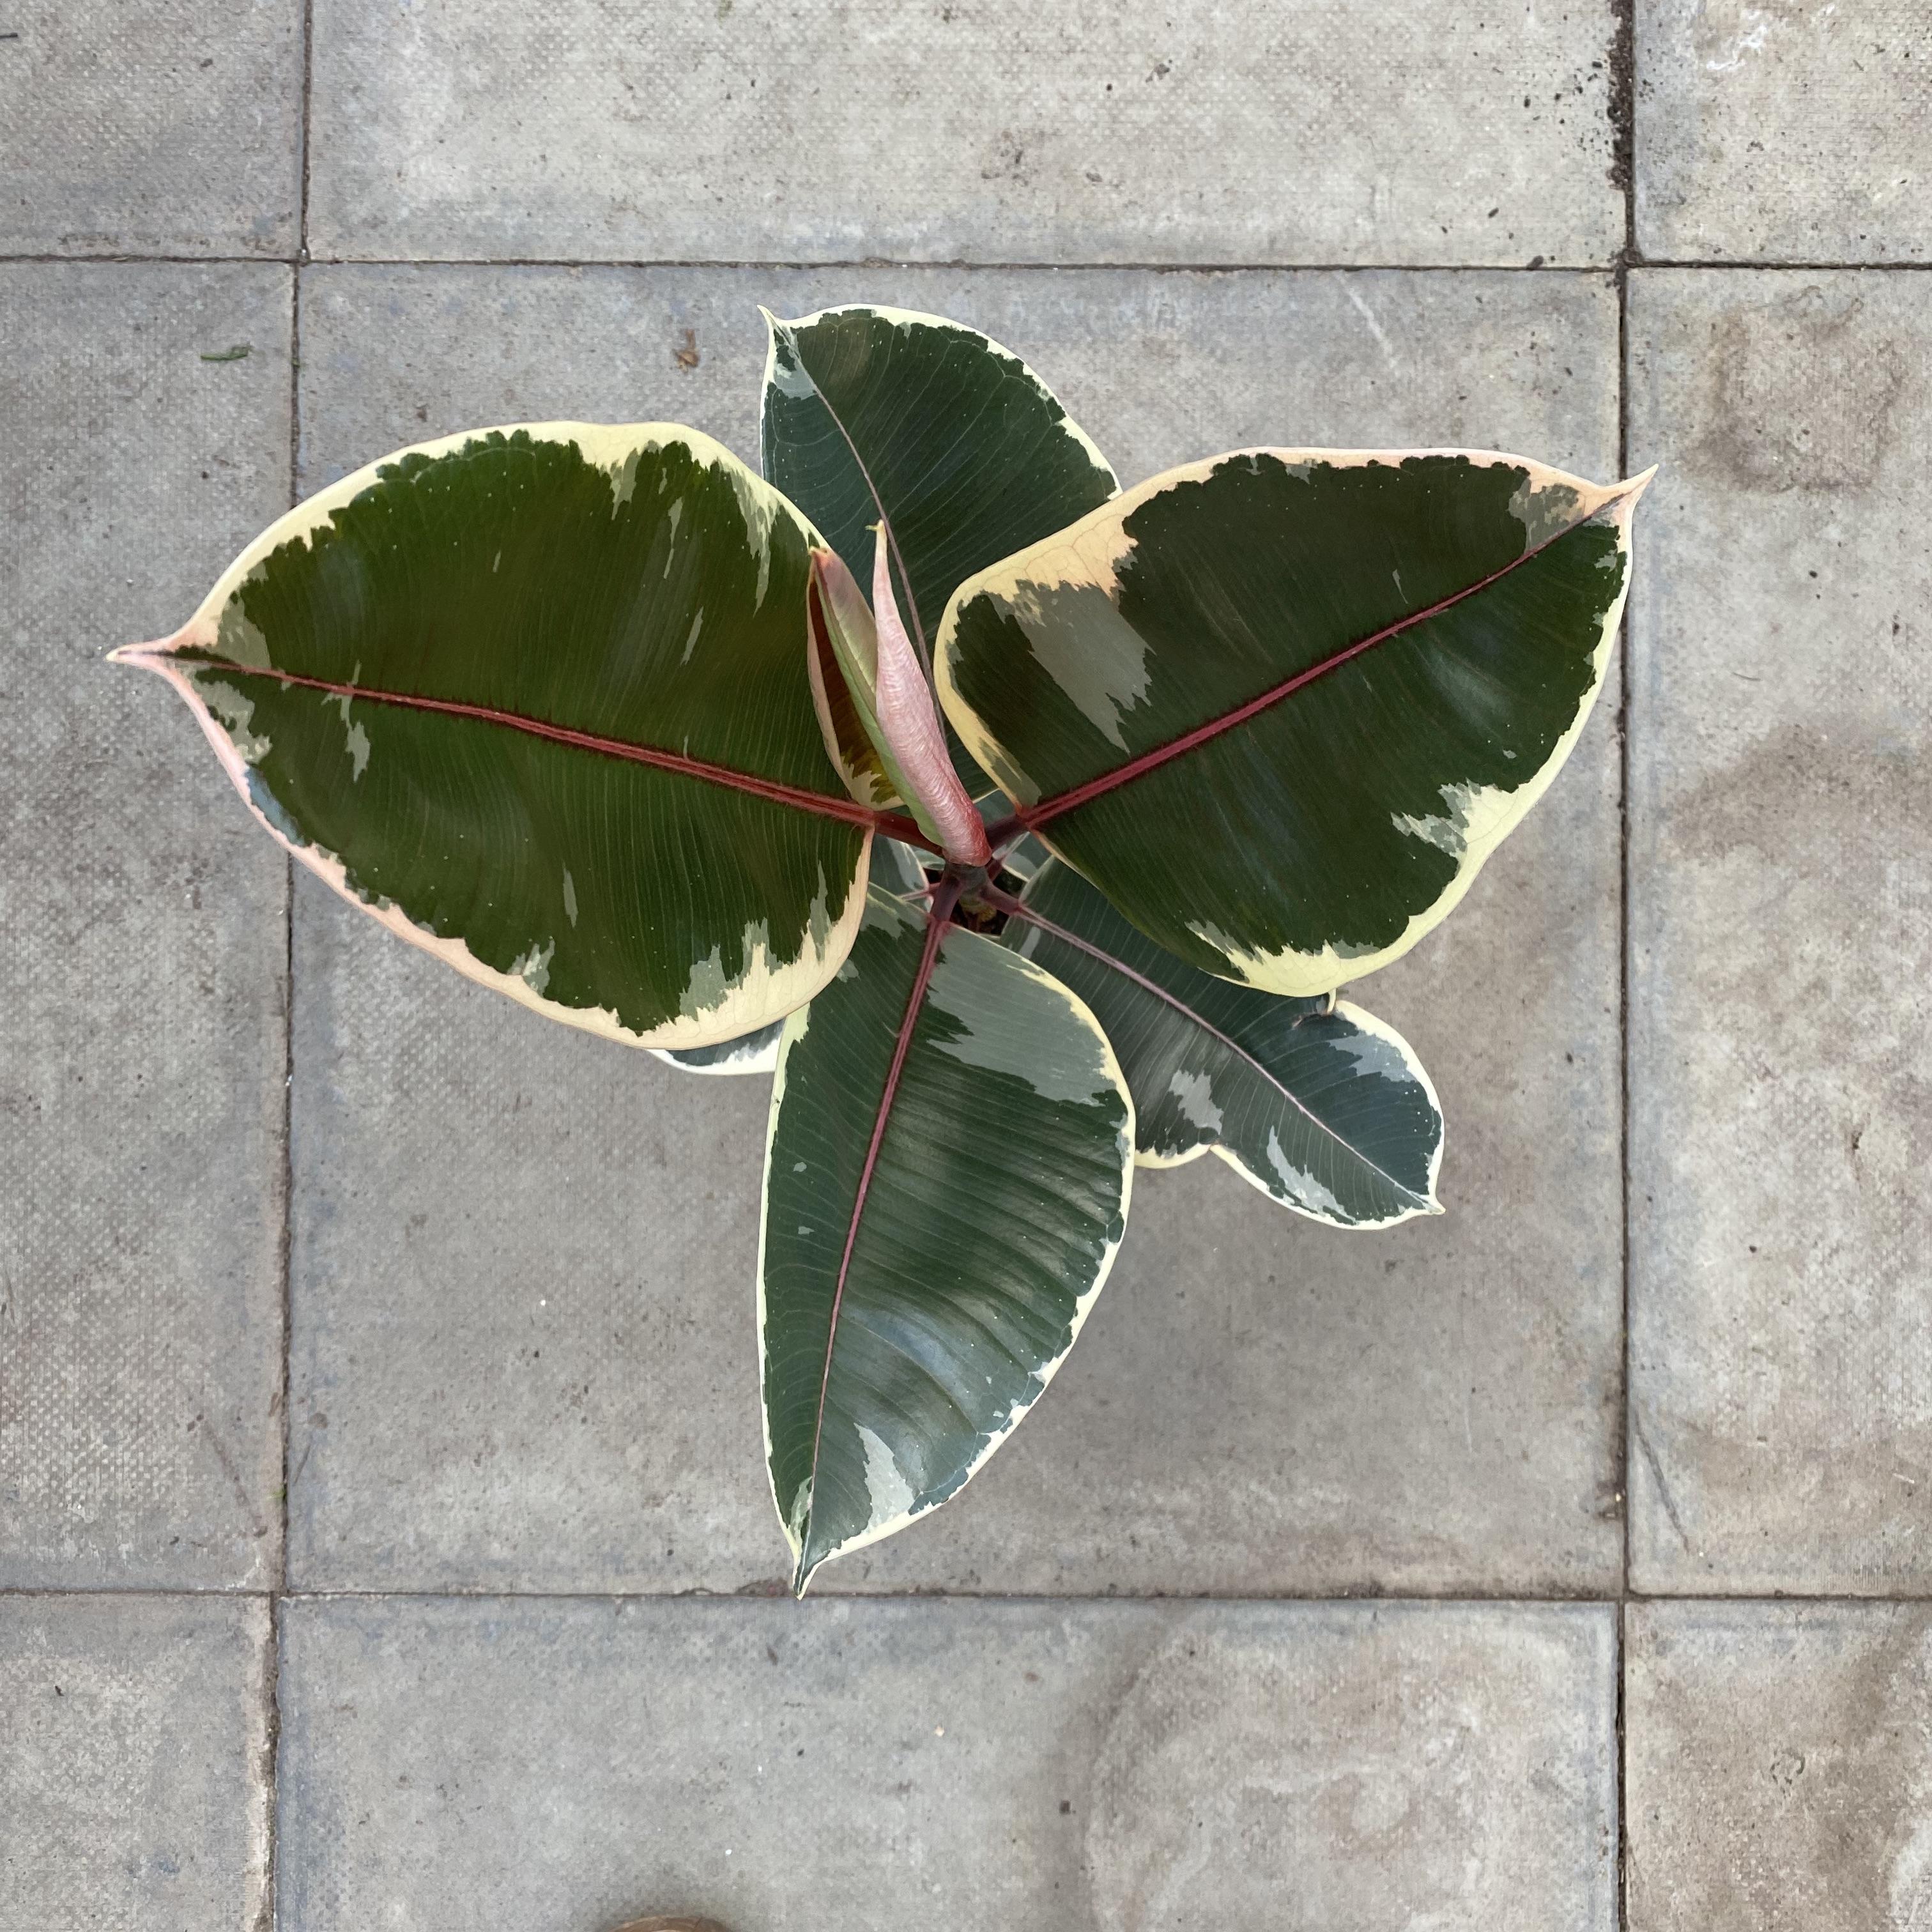 Ficus elastica 'Tineke' (Variegated Rubber Plant) 4 Sizes